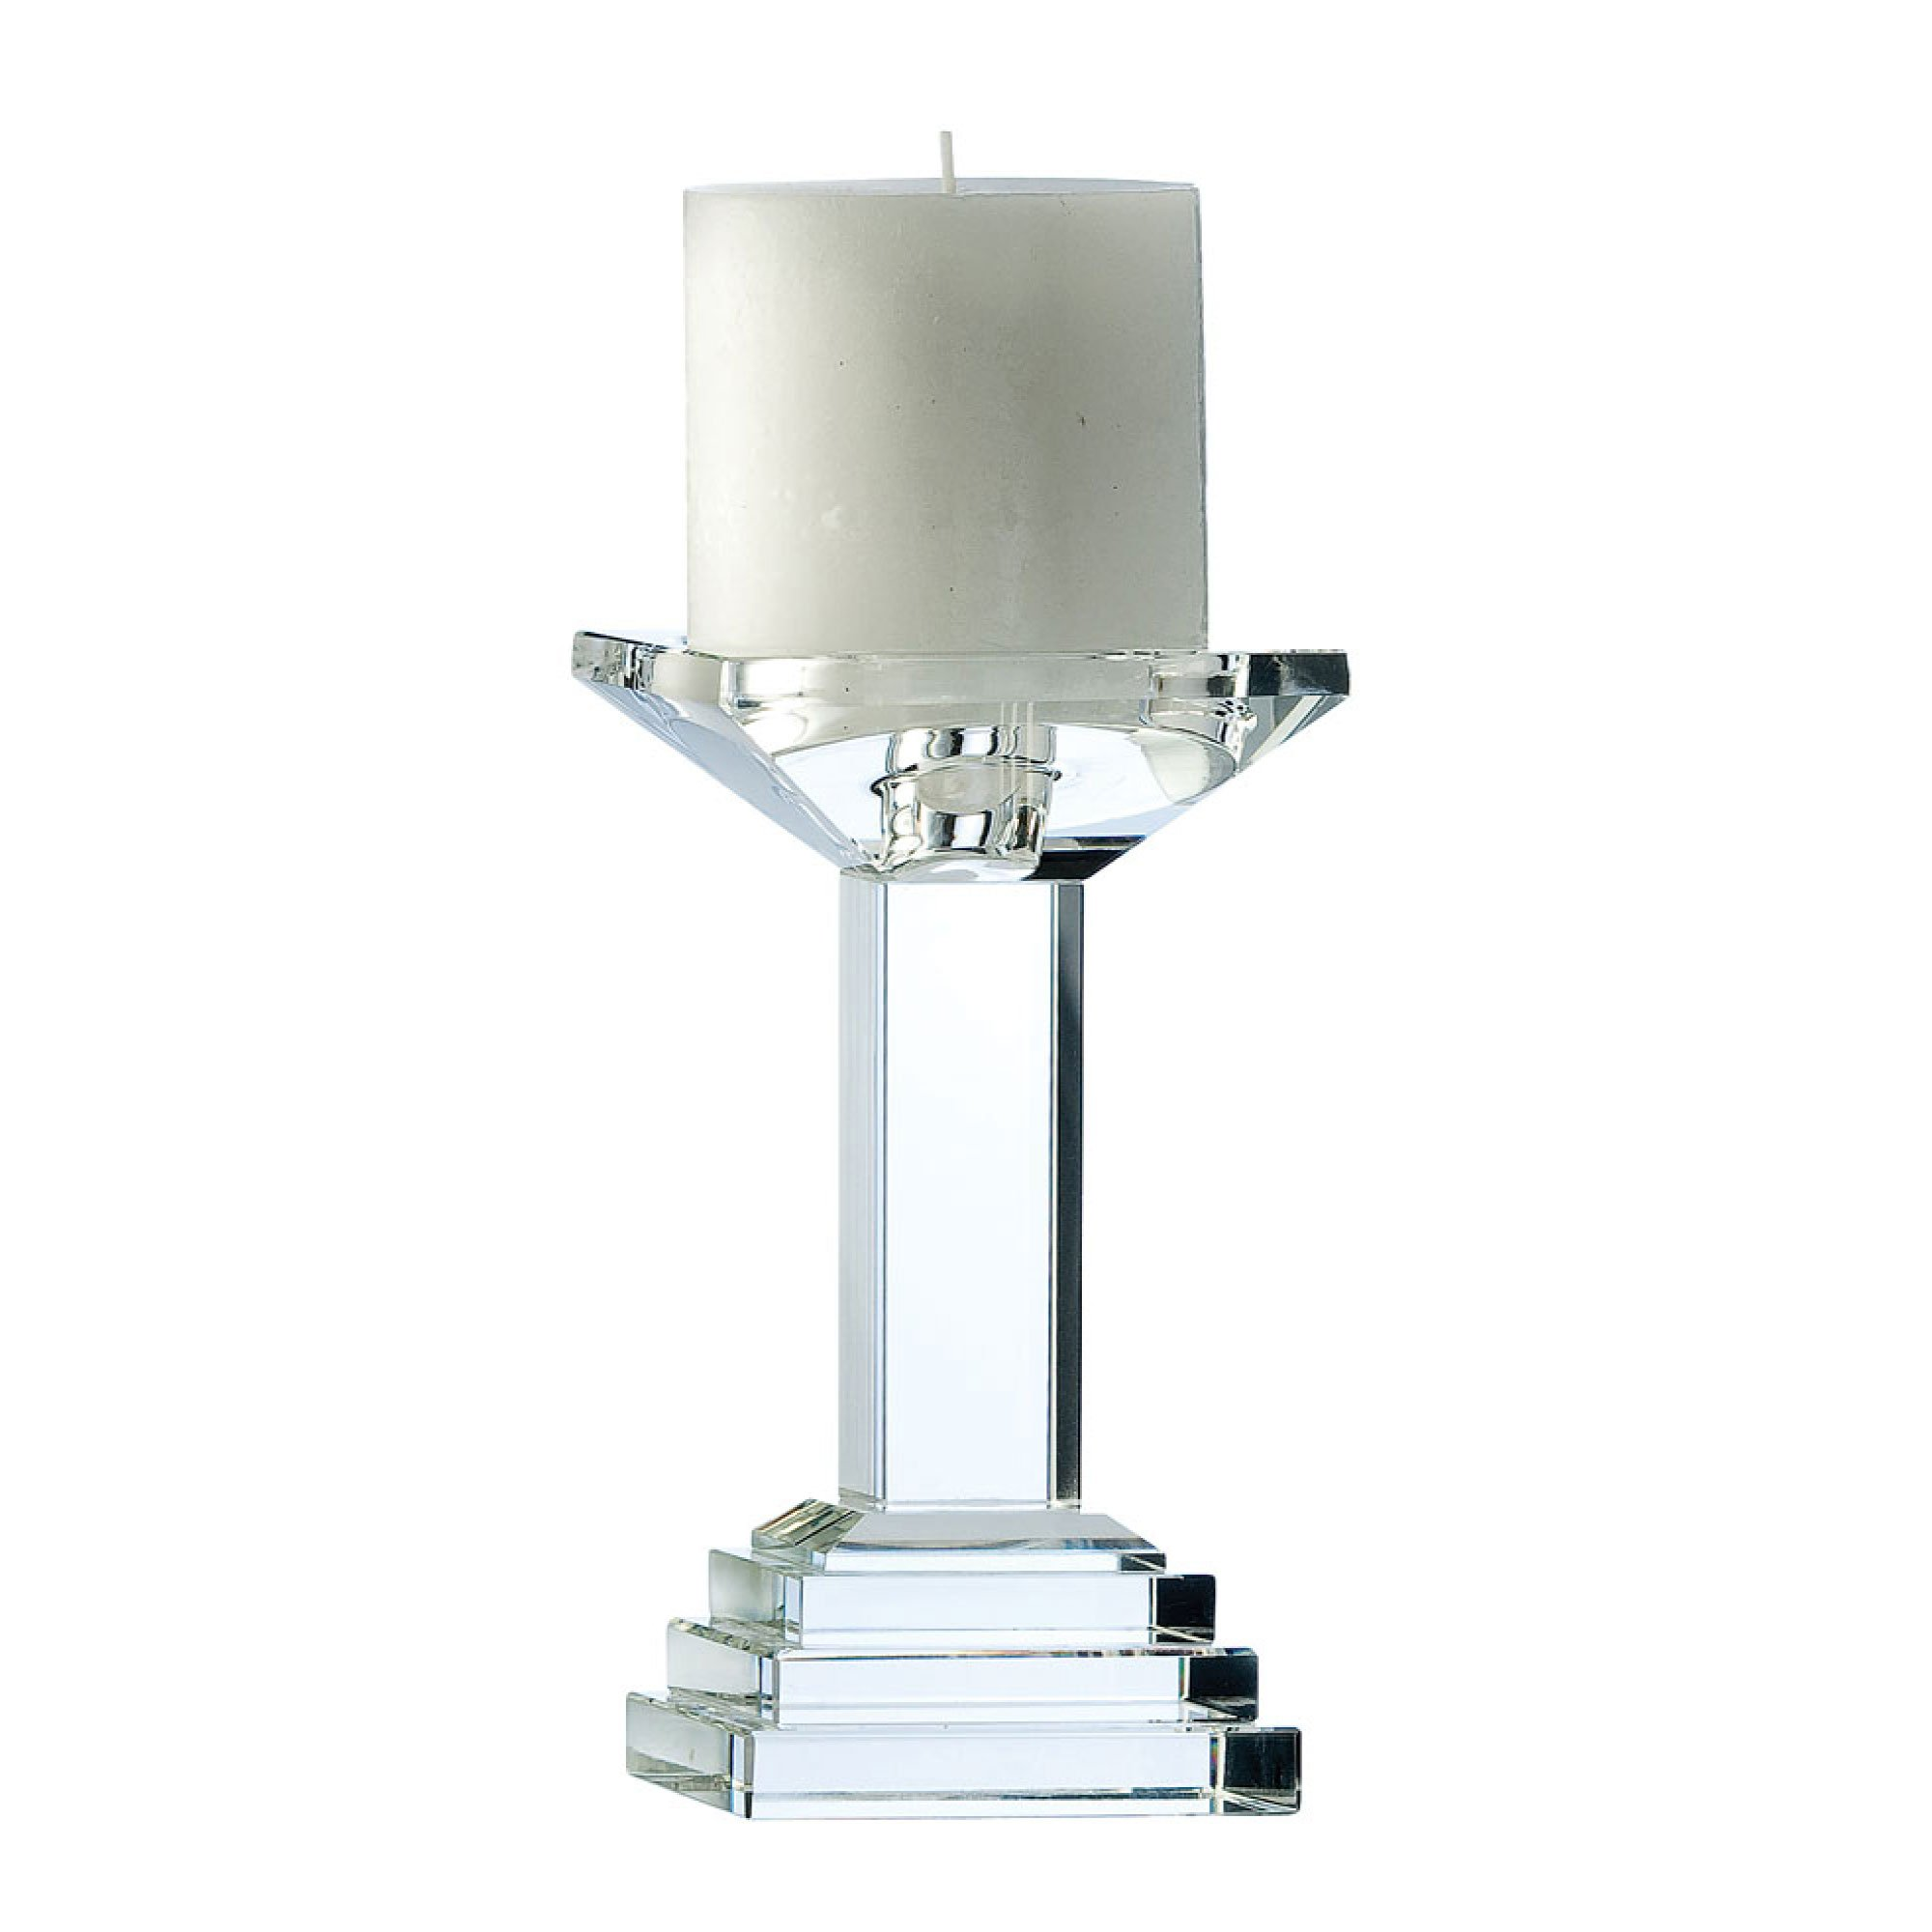 Galway Paris 7-Inch Candleholder